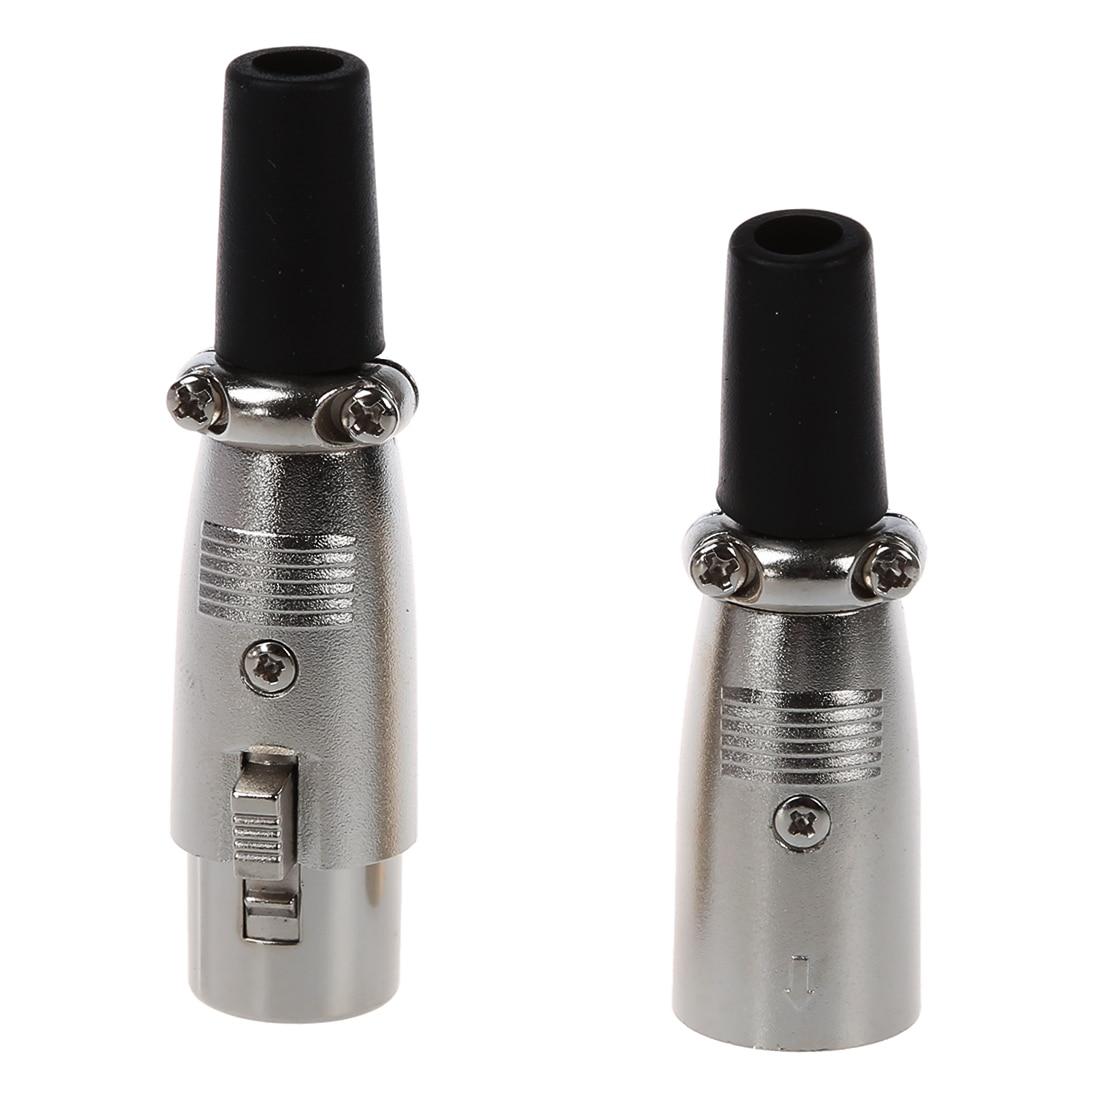 5 Pairs Male/Female 3 Pin XLR Jack Plug Microphone MIC Audio Connector 5 x 3 5mm 3 pole headphone replacement audio jack male plug soldering connector